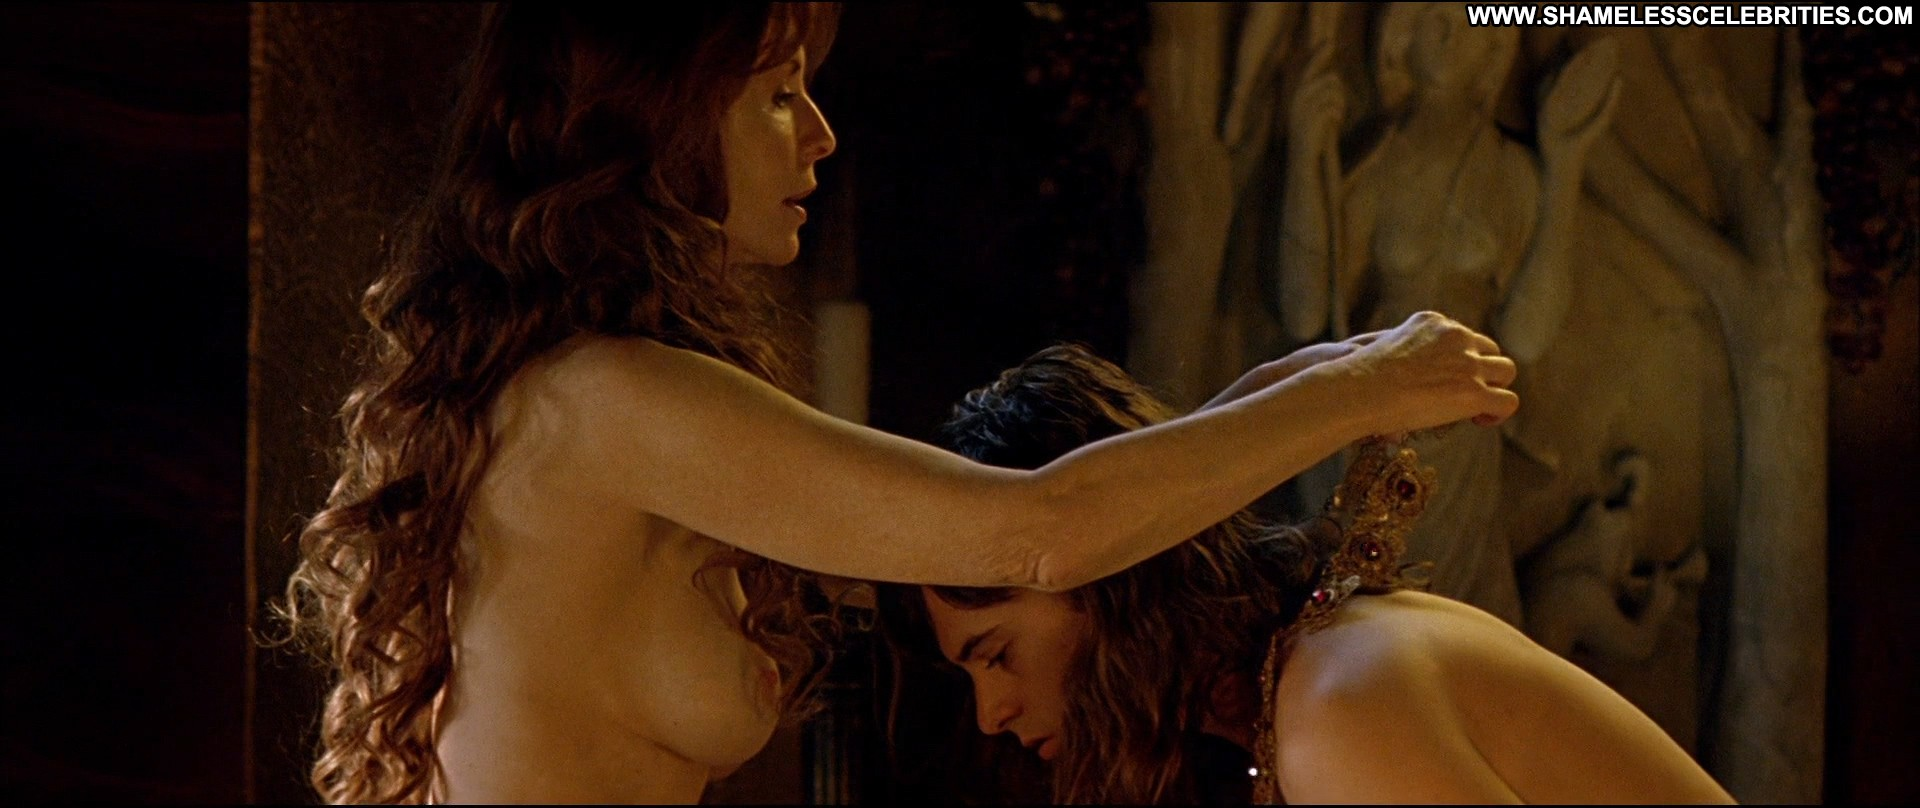 Emma Stone Nude Celebrity Pics